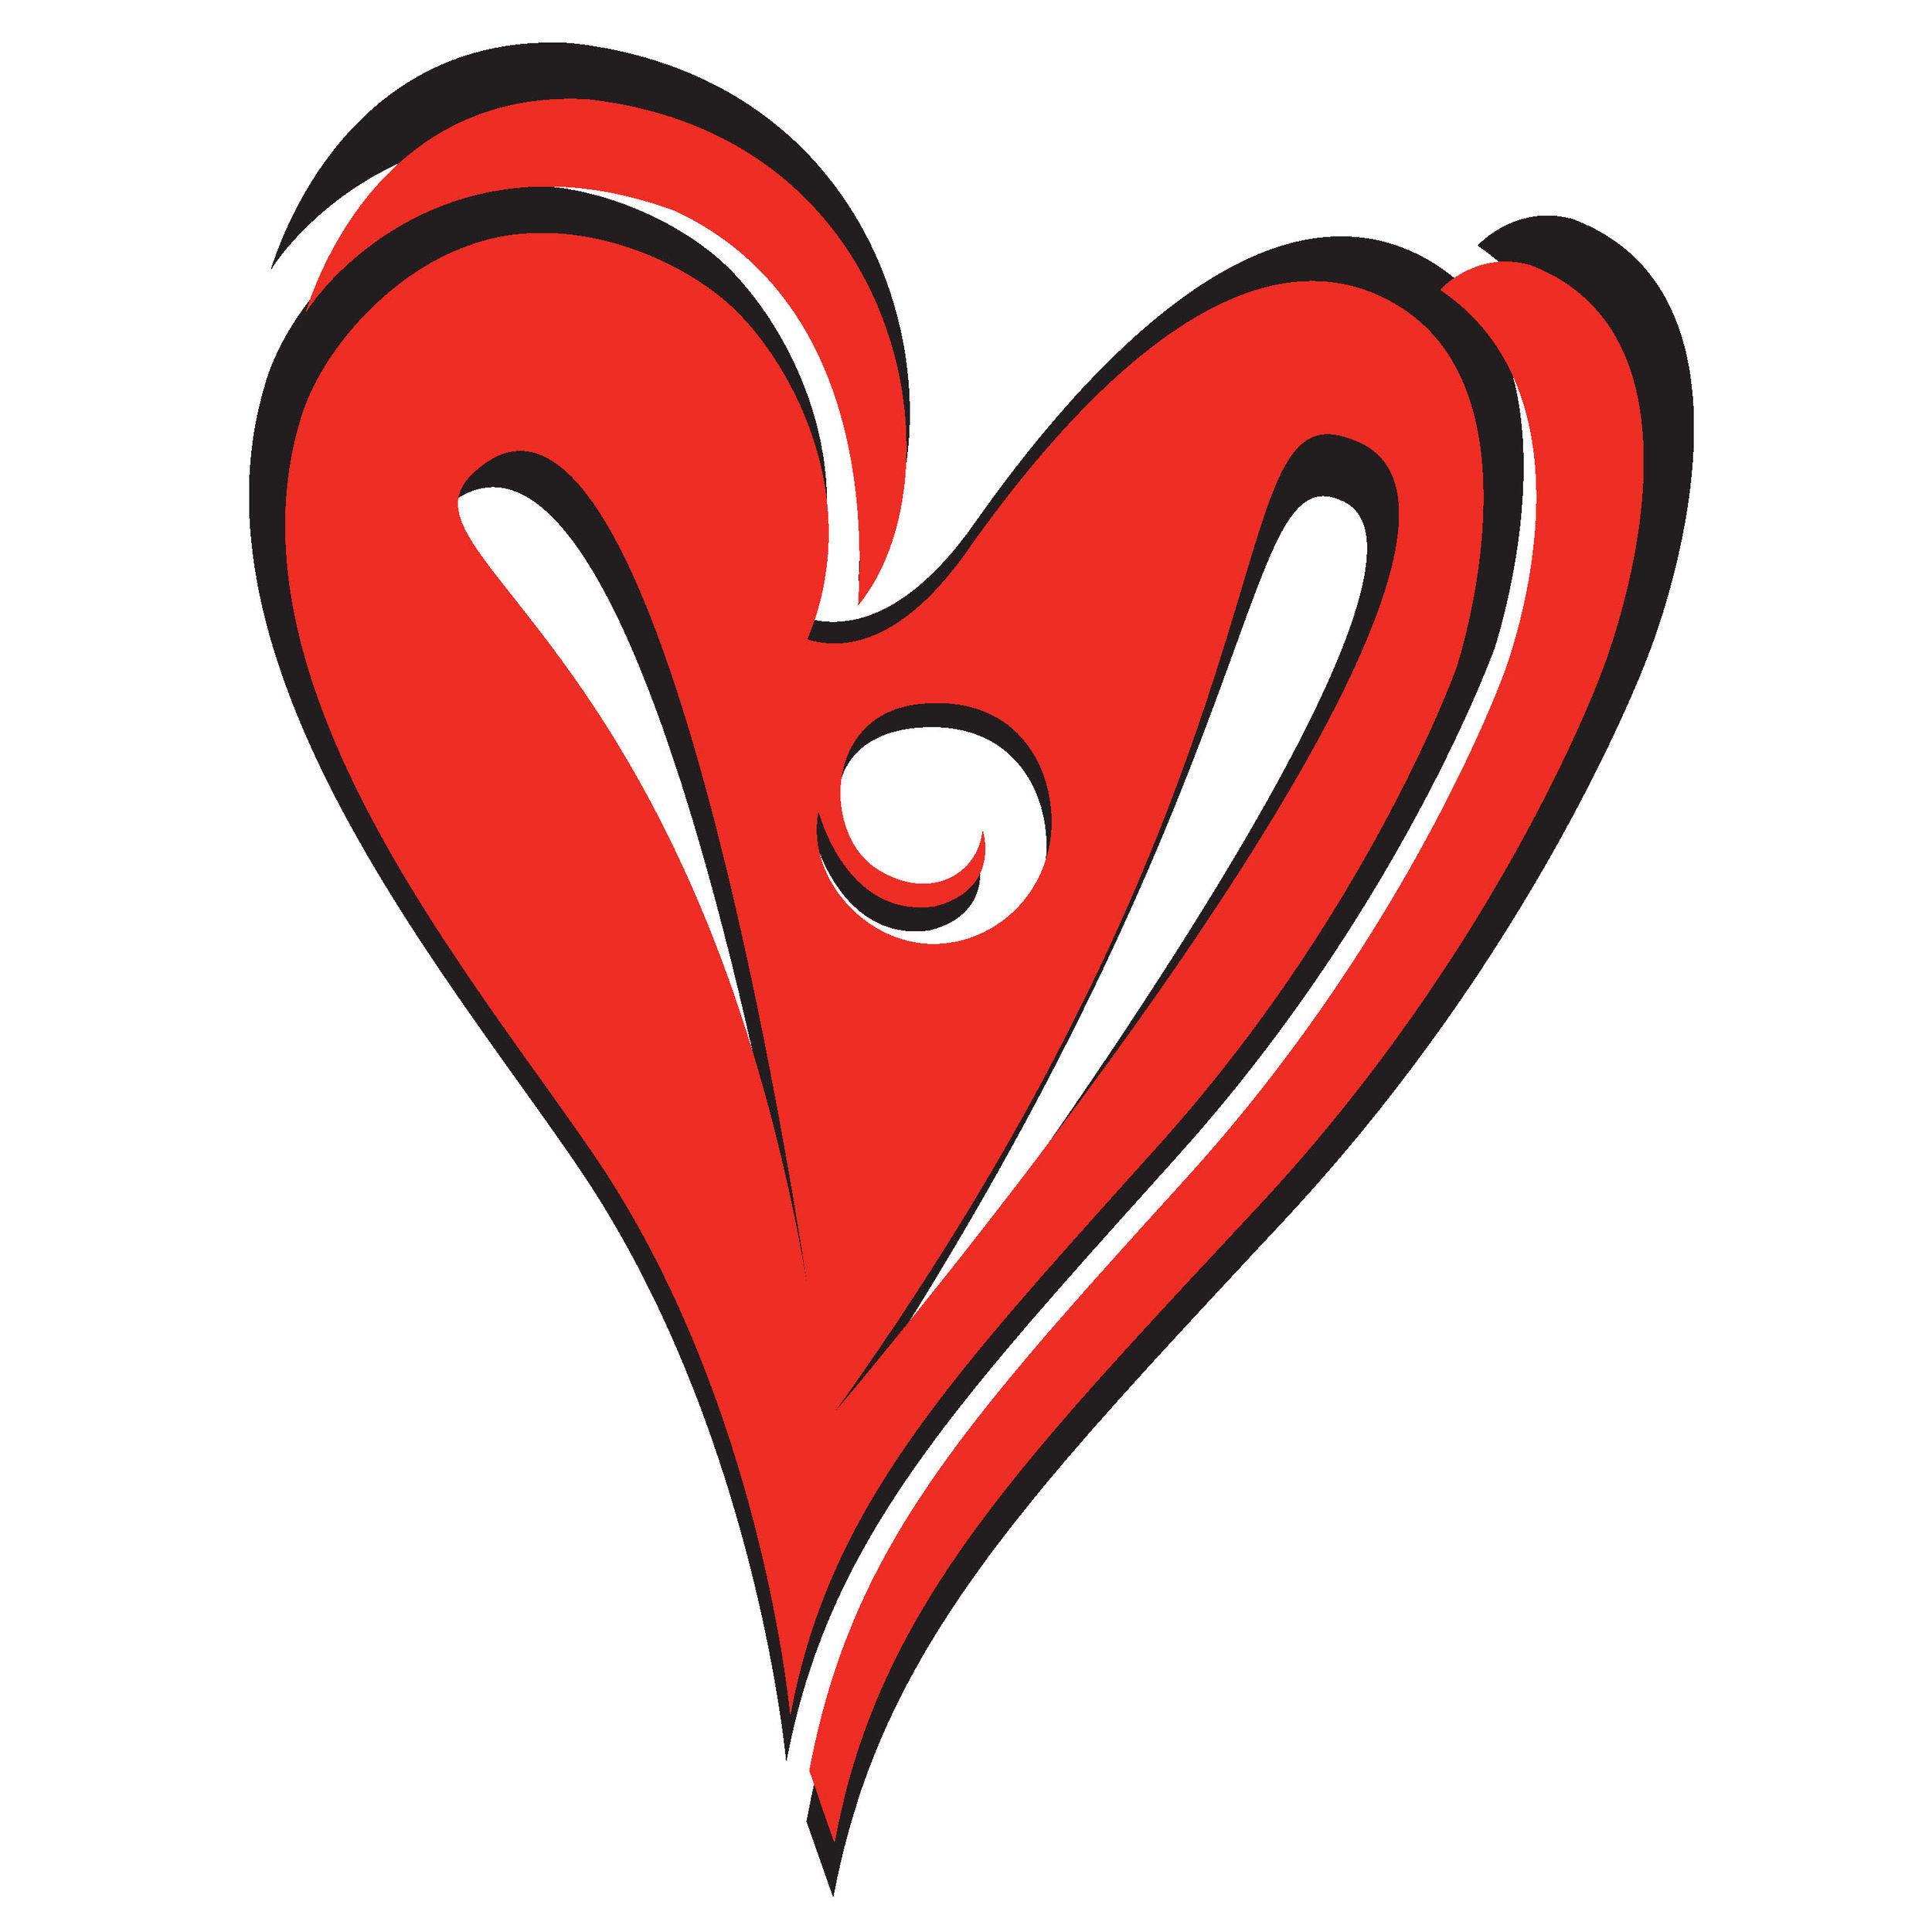 DF_Heart.jpg